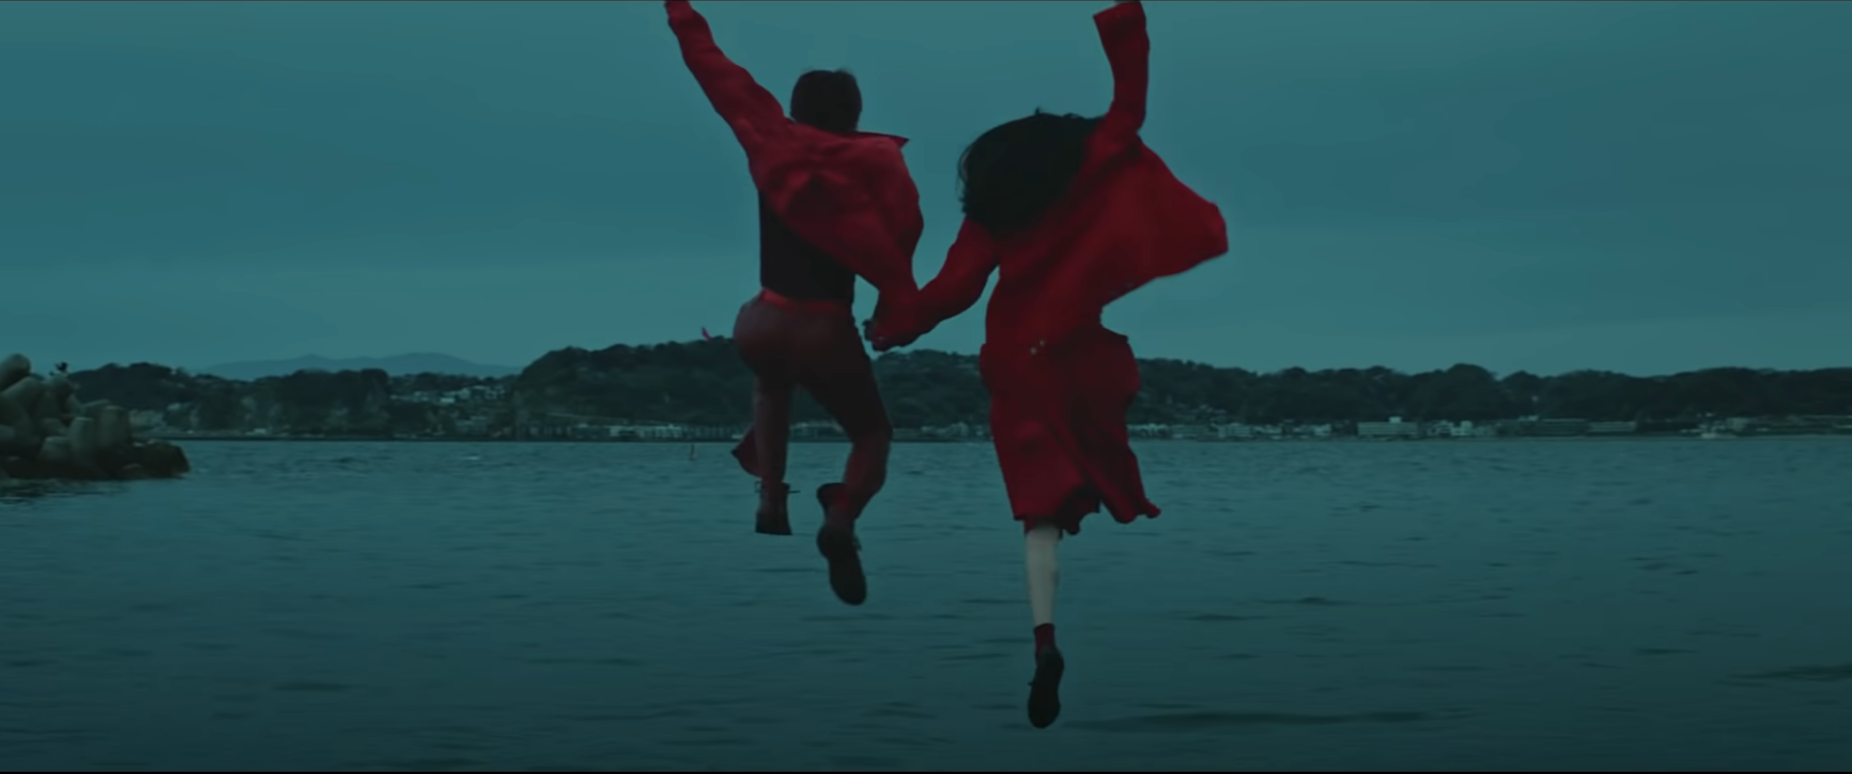 Dios 逃避行 MV撮影 水面撮影|ジール撮影事業部